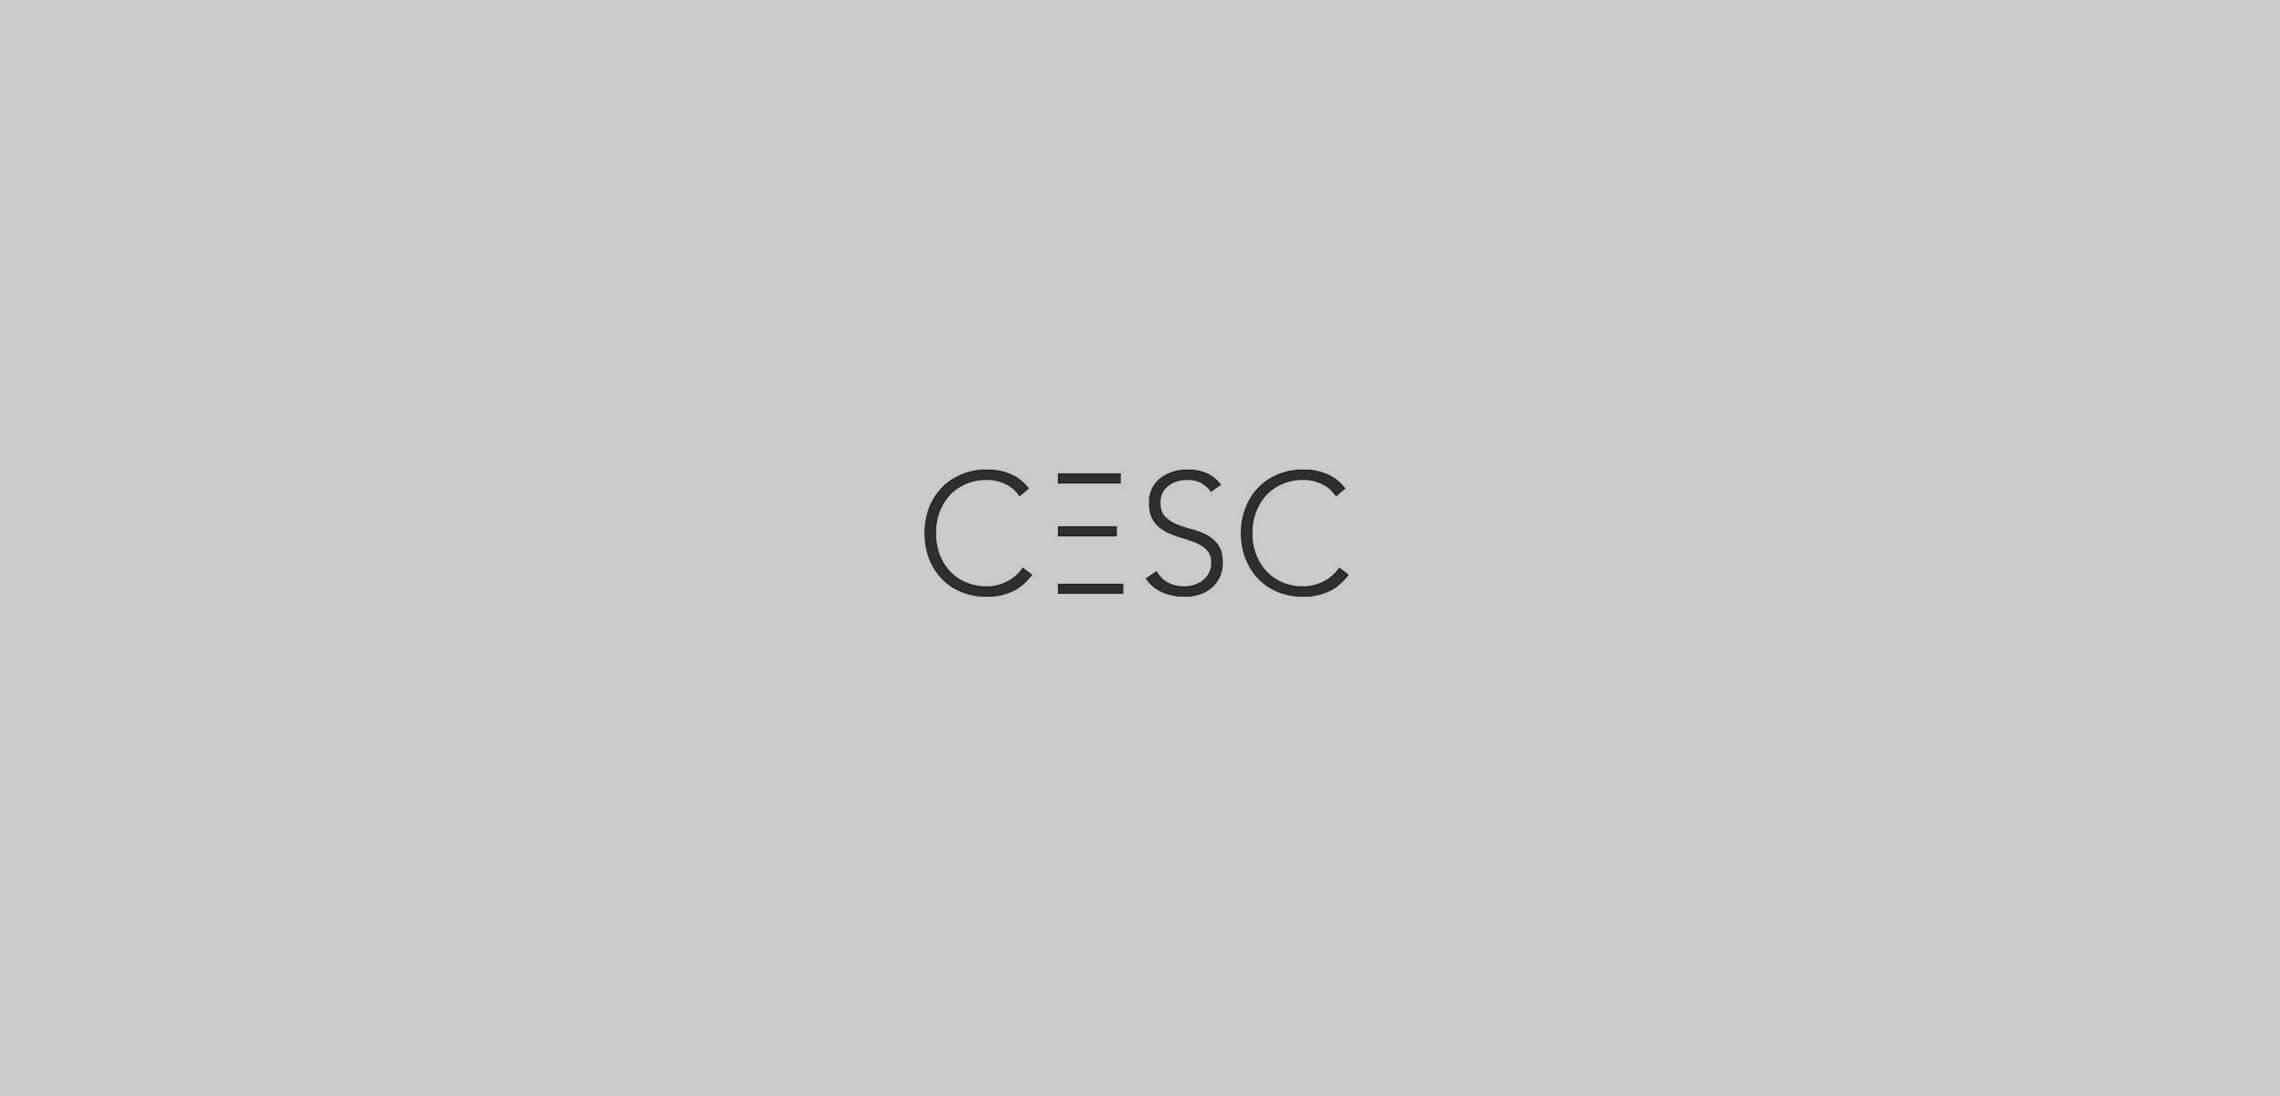 Cessy - Take A Ride EP hero